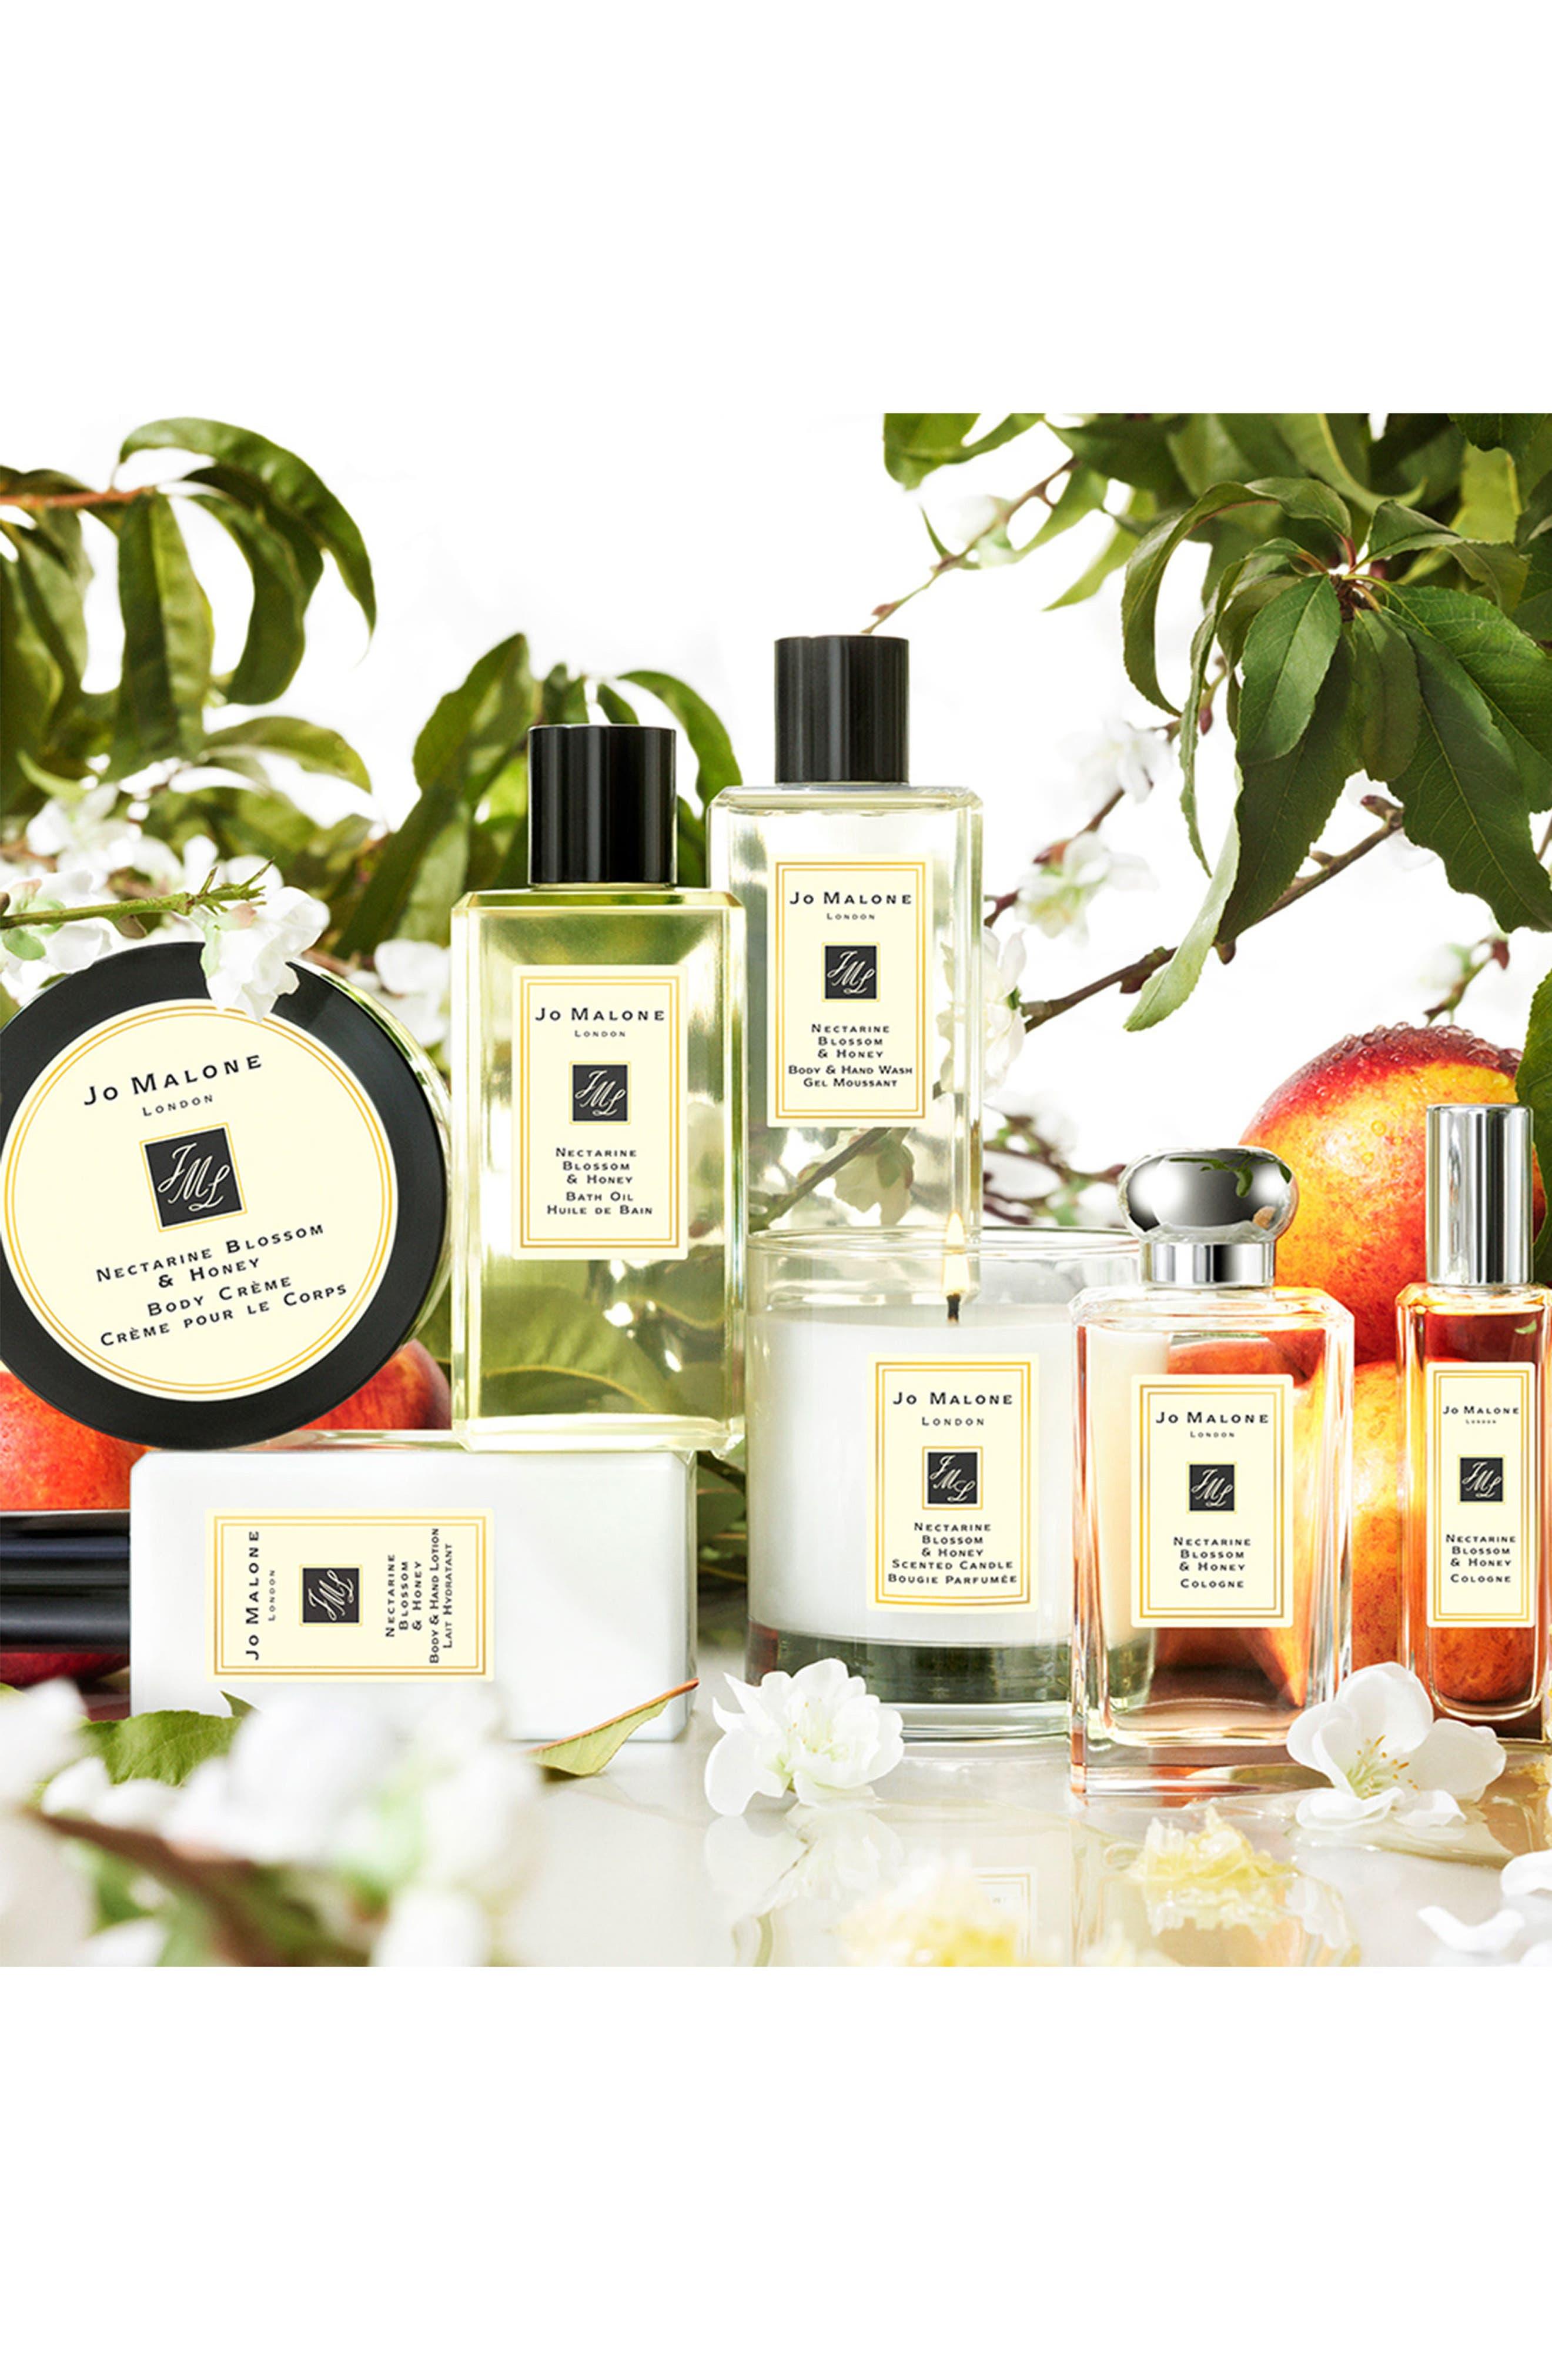 Alternate Image 3  - Jo Malone London™ 'Nectarine Blossom & Honey' Body & Hand Wash